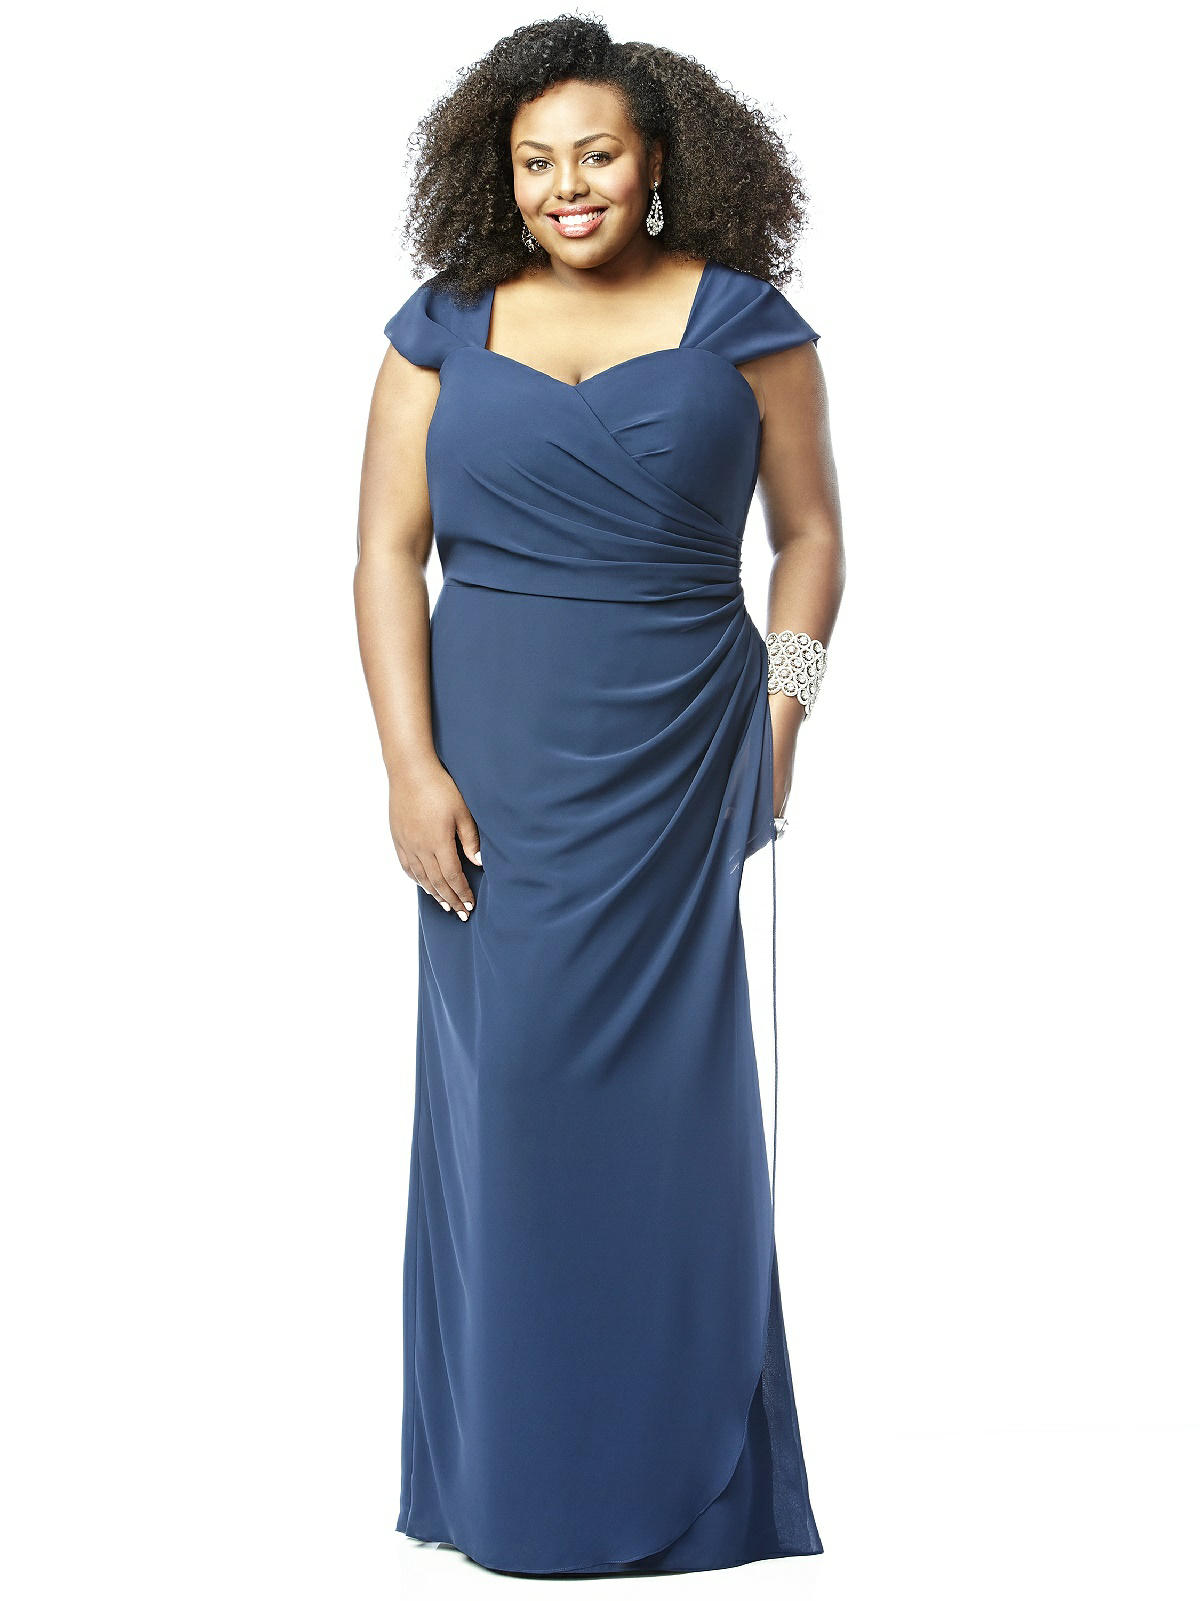 Lovelie Plus Size Bridesmaid Dress 9008 The Dessy Group